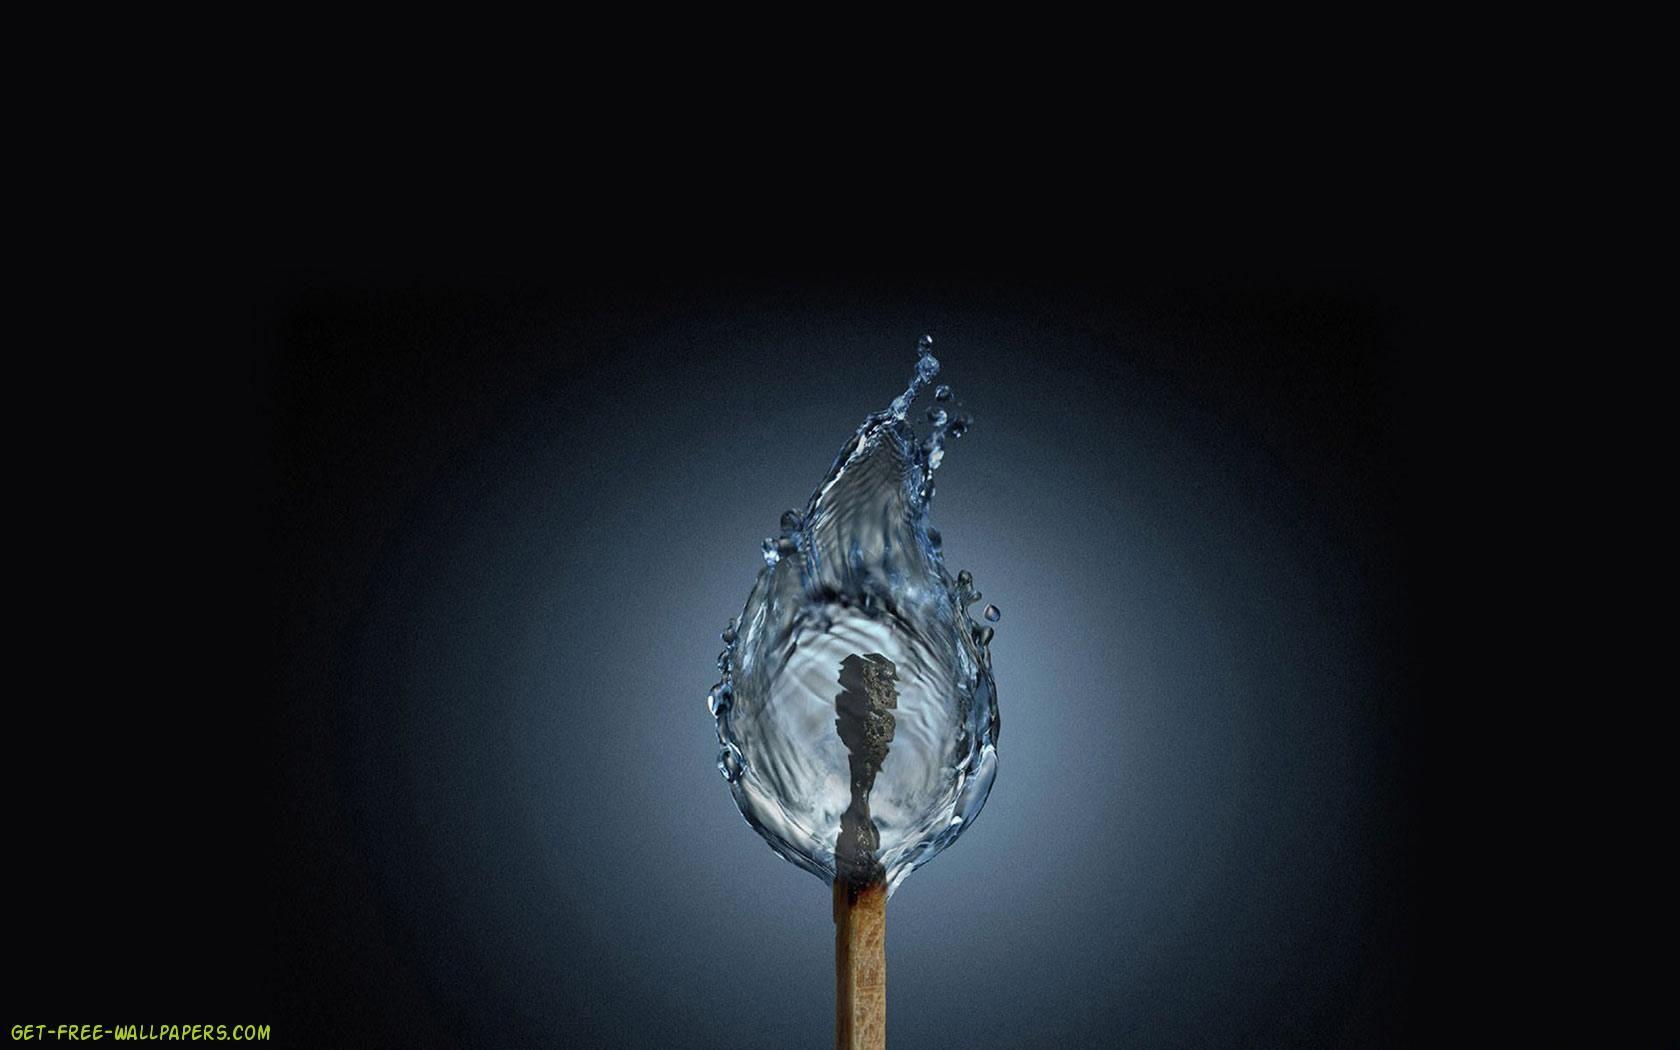 Awesome Fire Water 3D U0026 Digital Art Wallpaper   HD Wallpapers Download